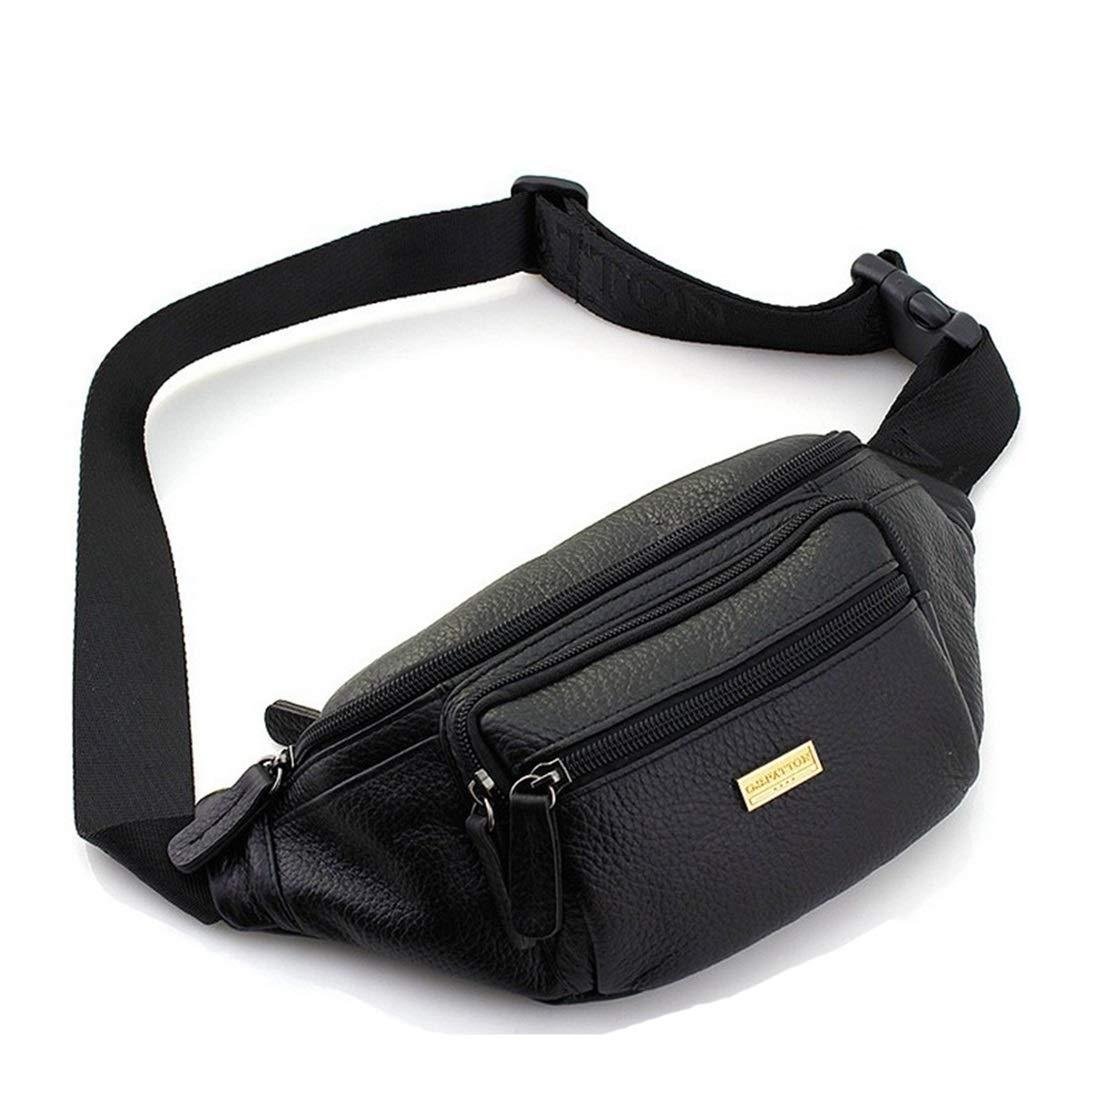 RABILTY Belt Holster Bag Fanny Waist Pack Crossbody Bag for Men Boy Black Cowhide Travel Neck Pouch Color : Black